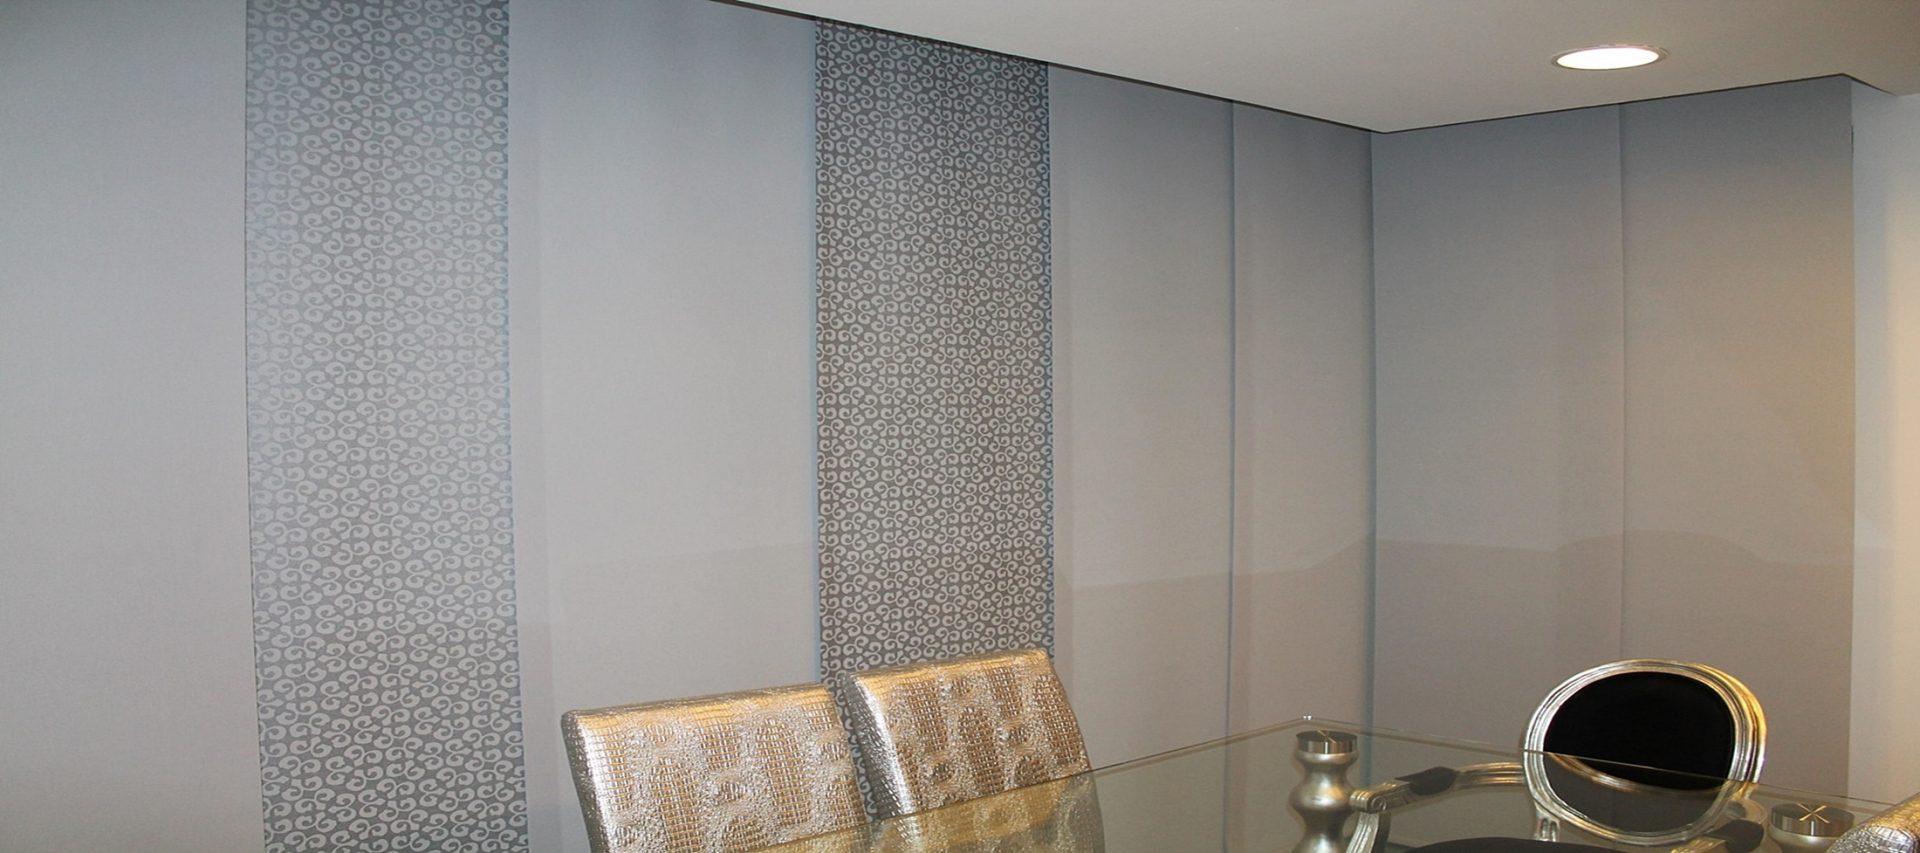 paneluri japoneze lux